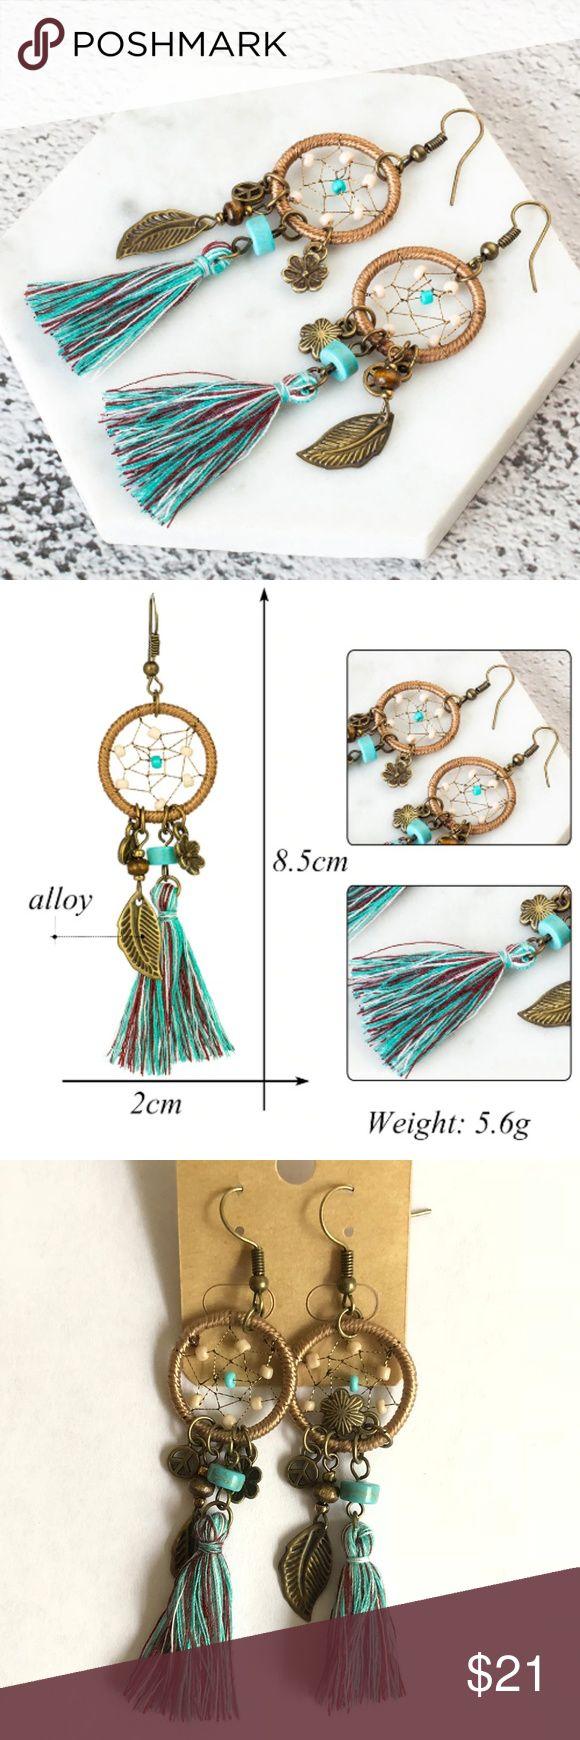 NEUE Boho Dreamcatcher Quaste Seide Ohrringe Kategorie: Modeschmuck Farbe: Blau …